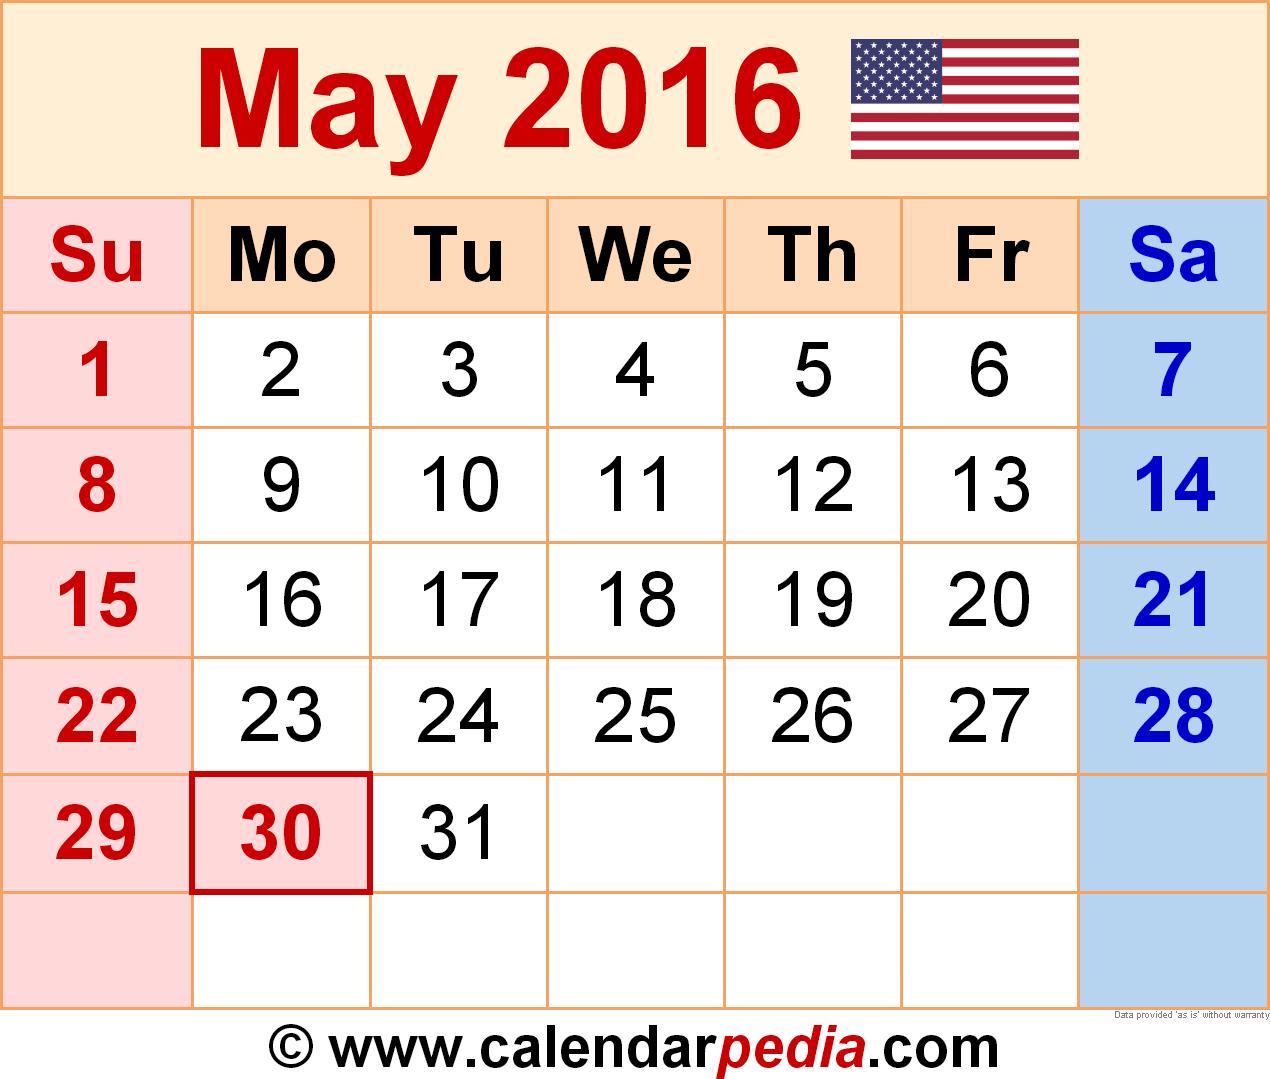 Mayan Calendar 2016